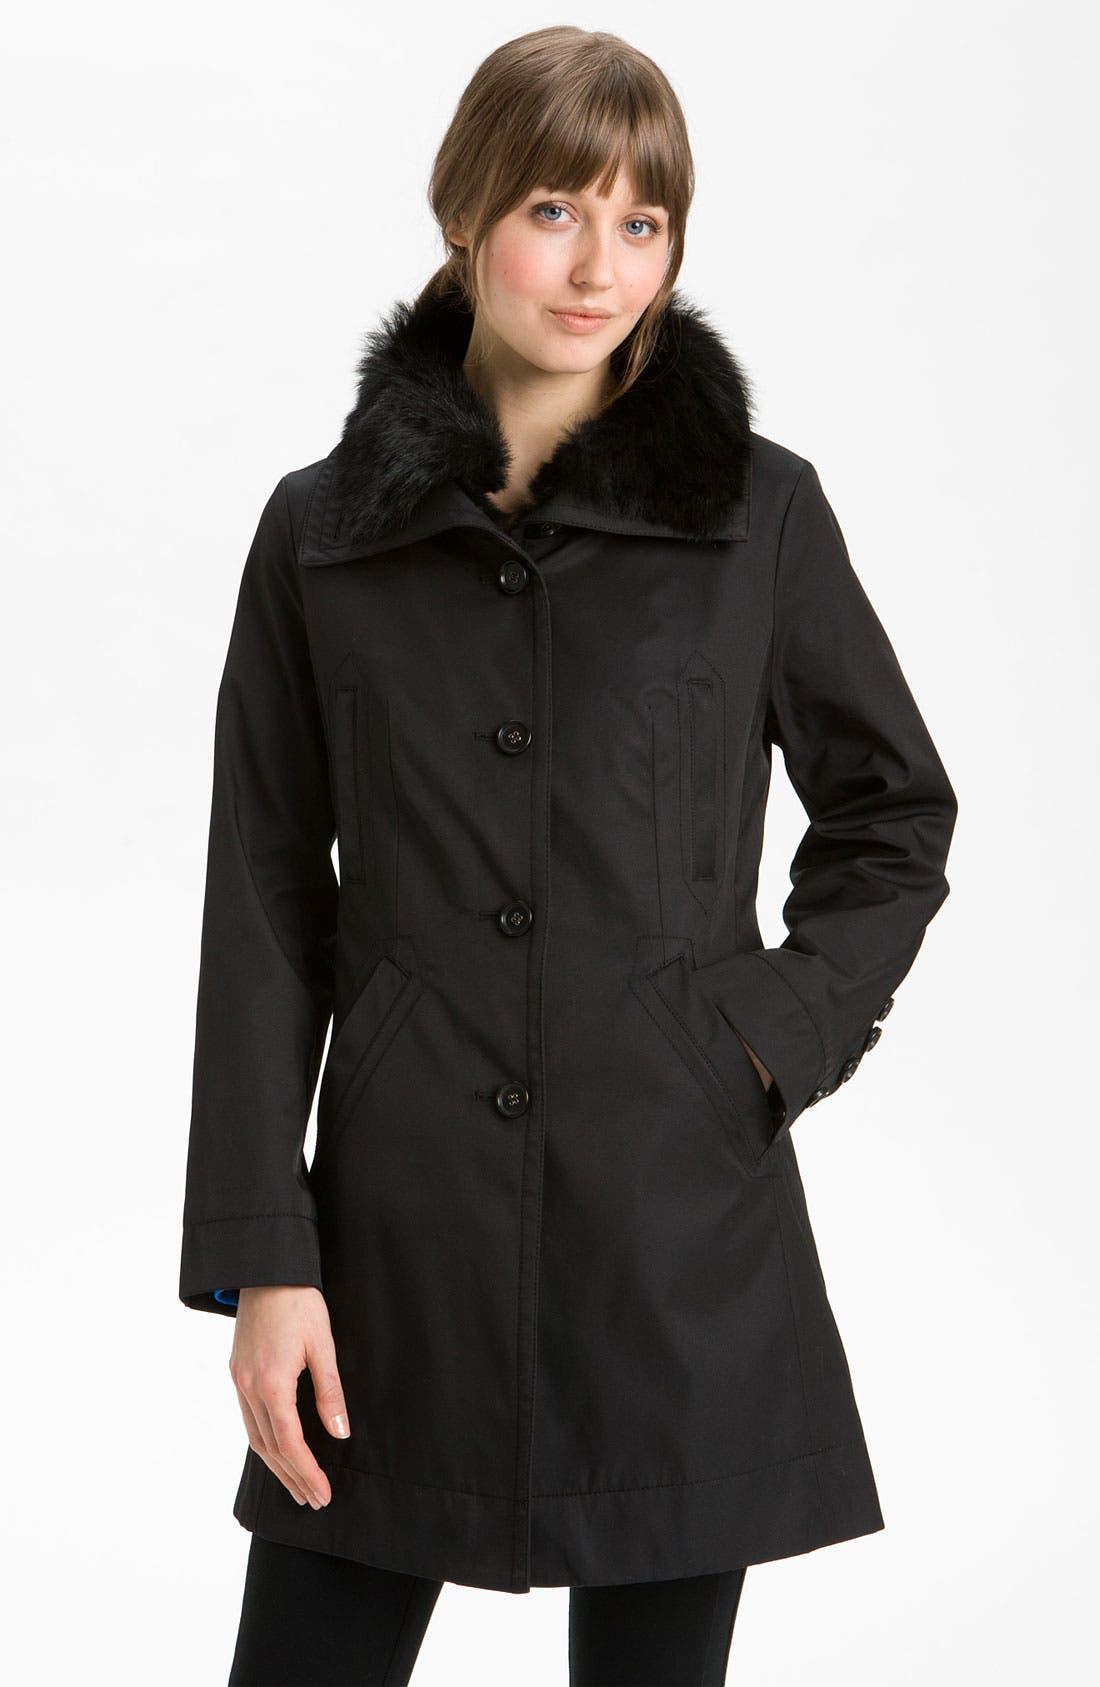 Alternate Image 1 Selected - Hilary Radley Detachable Fur Collar Raincoat